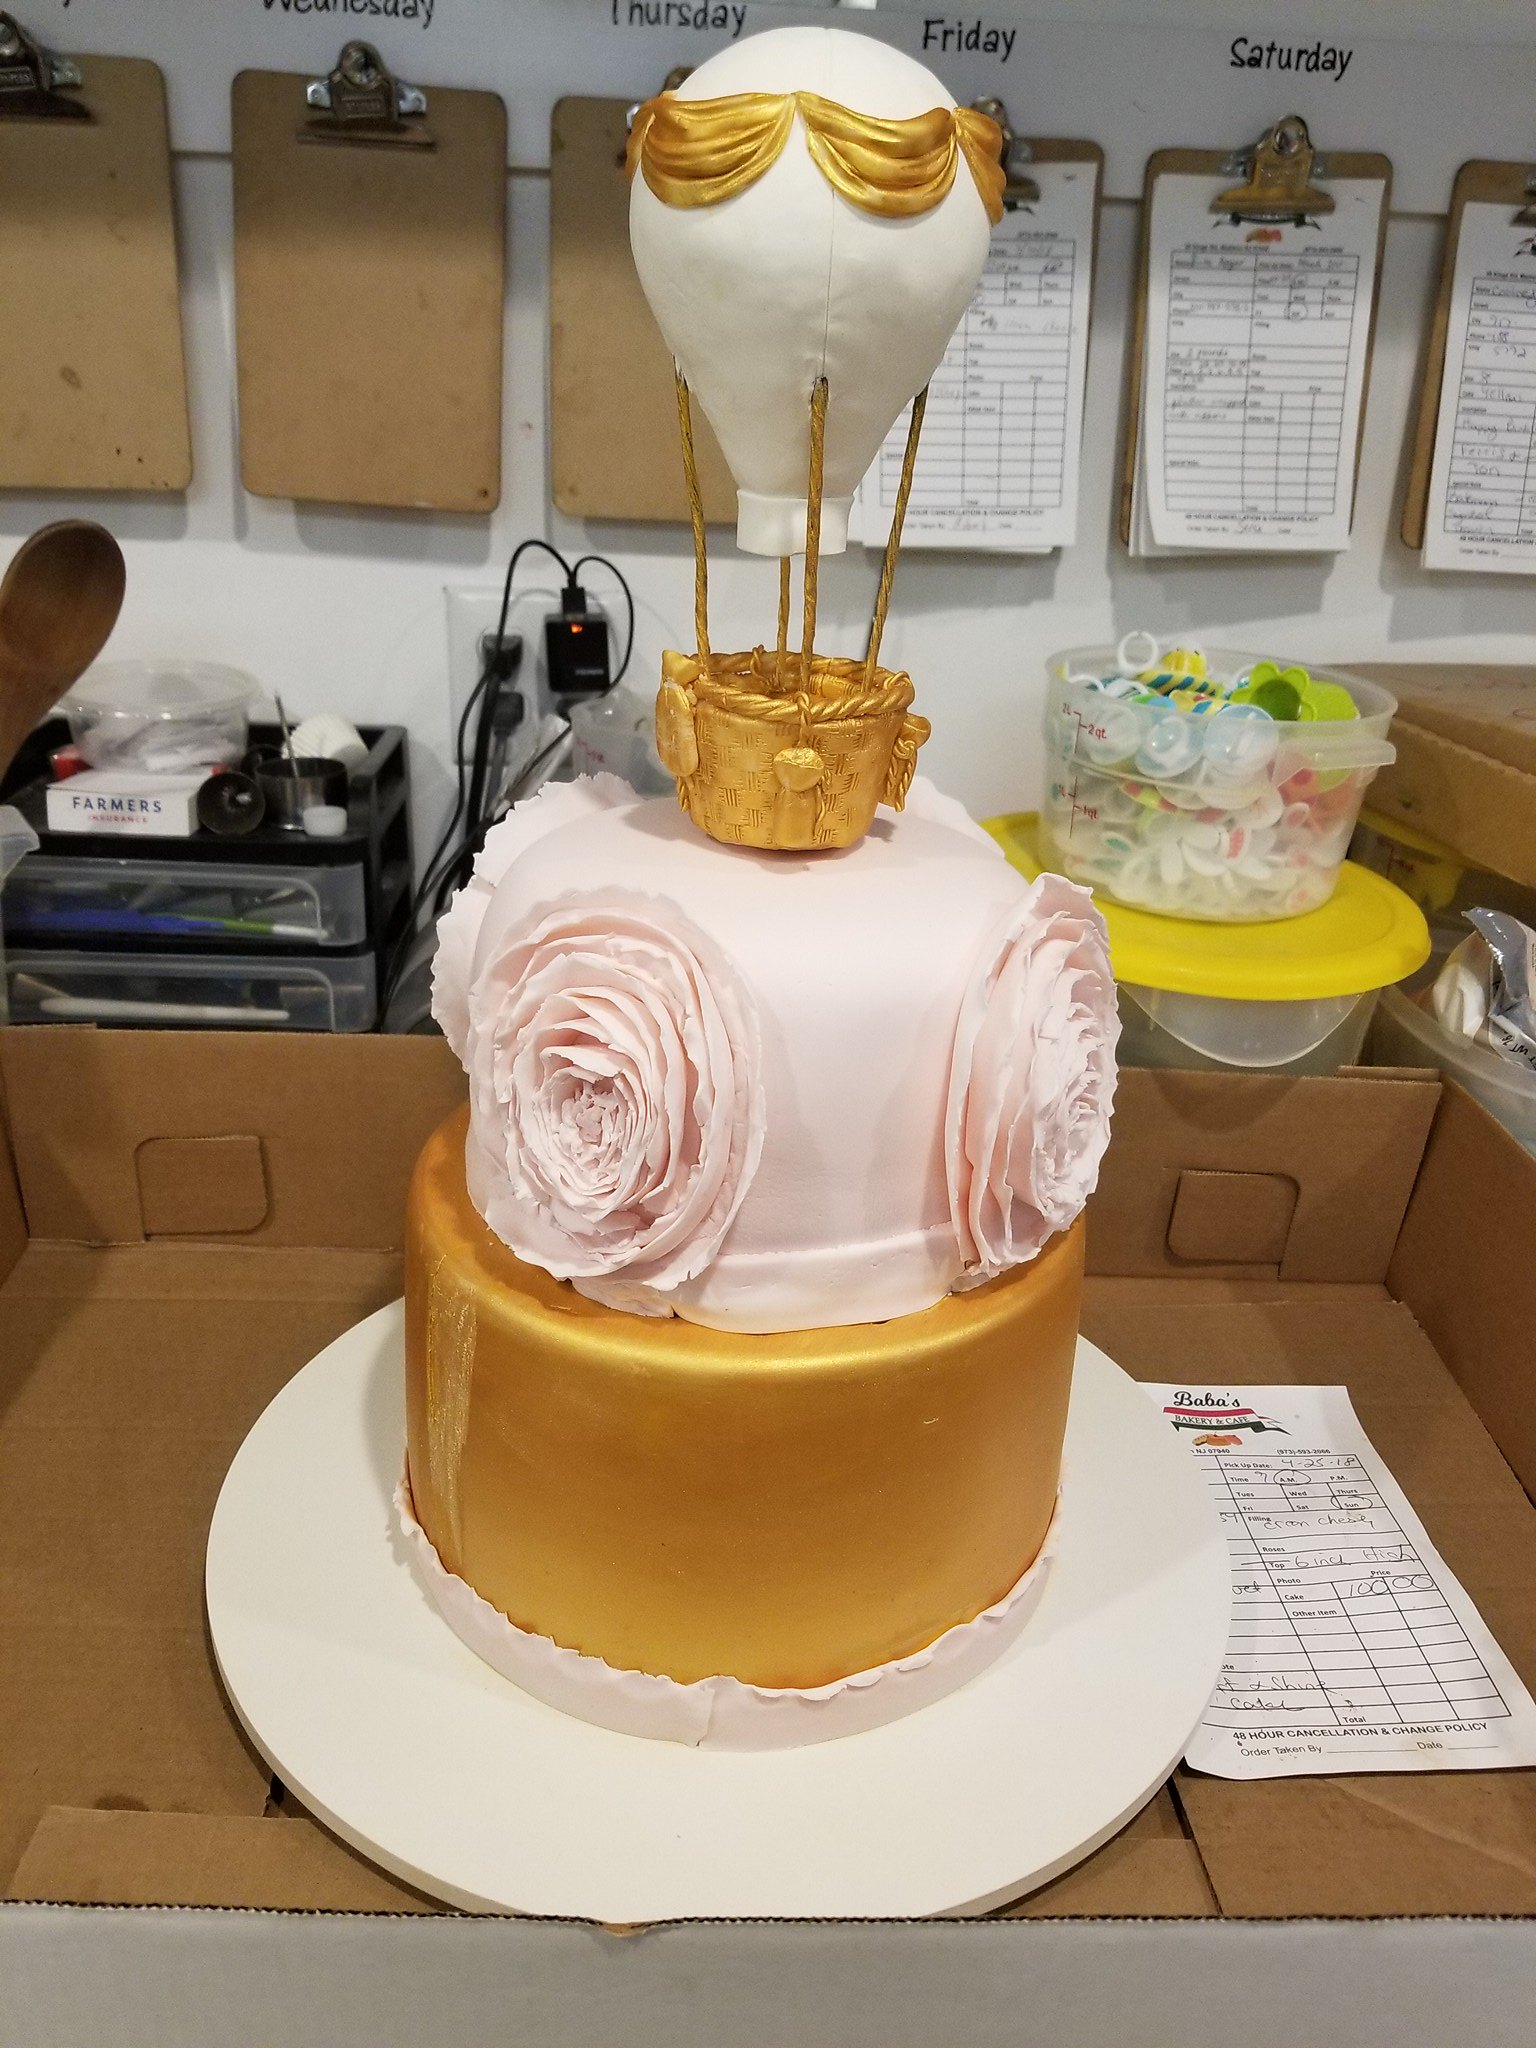 Cake by Baba's Bakery & Cafe